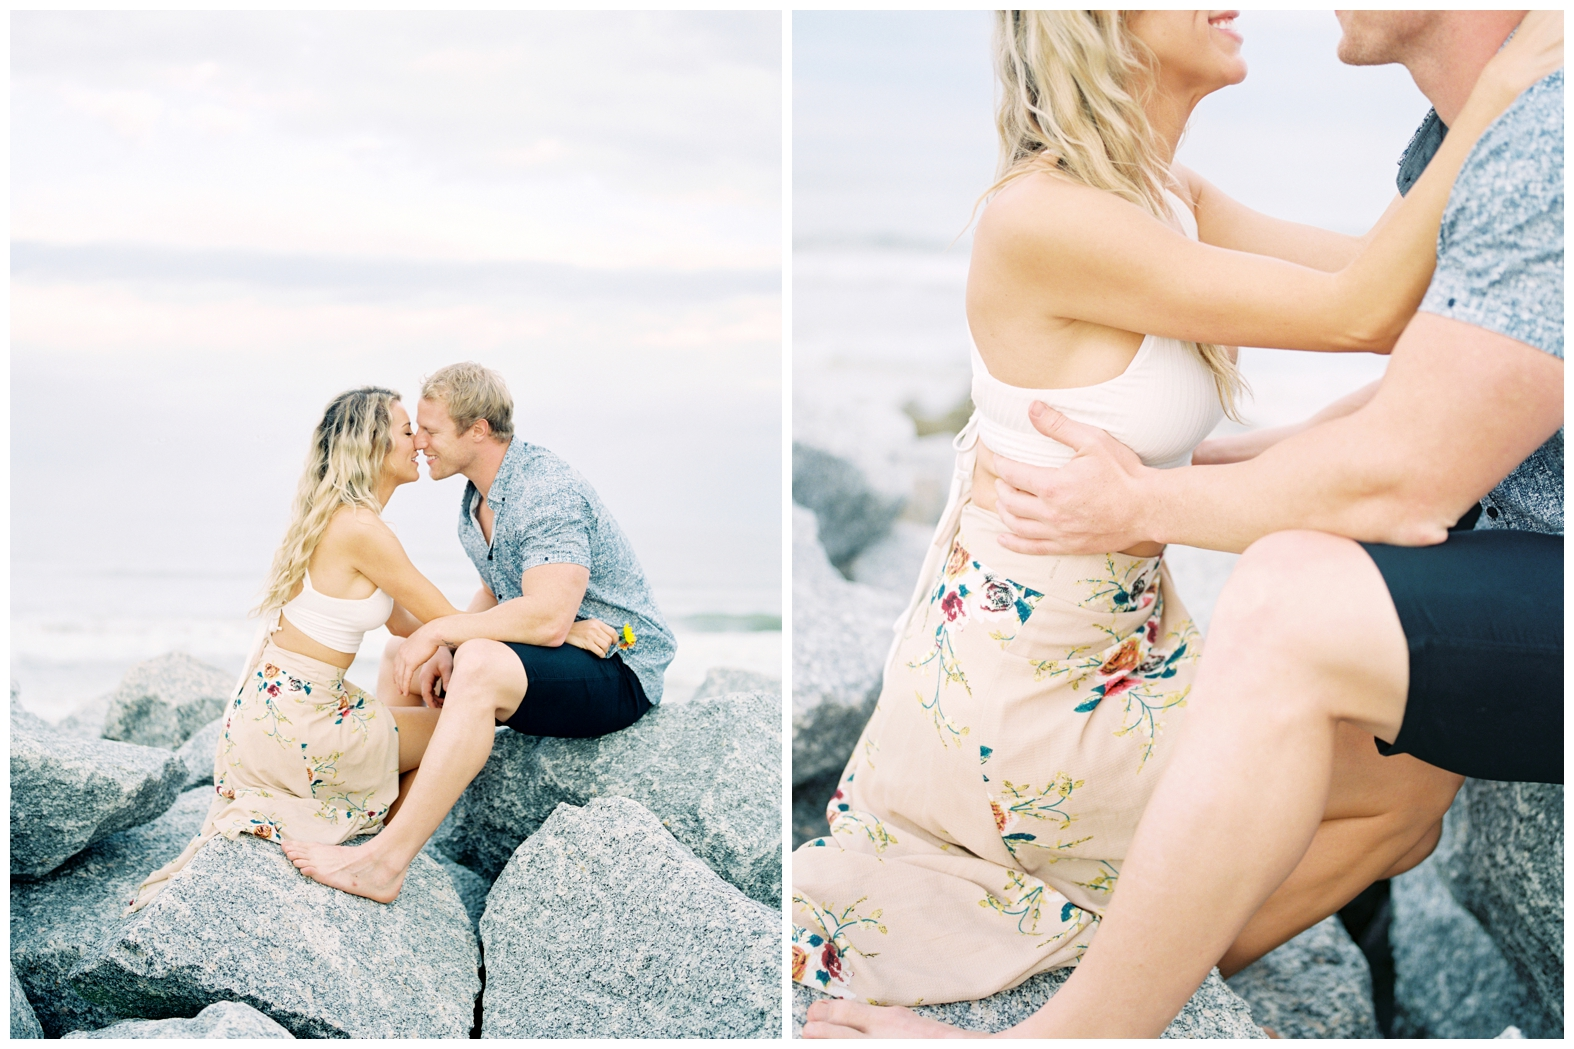 Lisa Silva Photography -Beachy Lifestyle Engagement Session in Palm Coast Florida - Jacksonville Film Photograpgers_0015.jpg